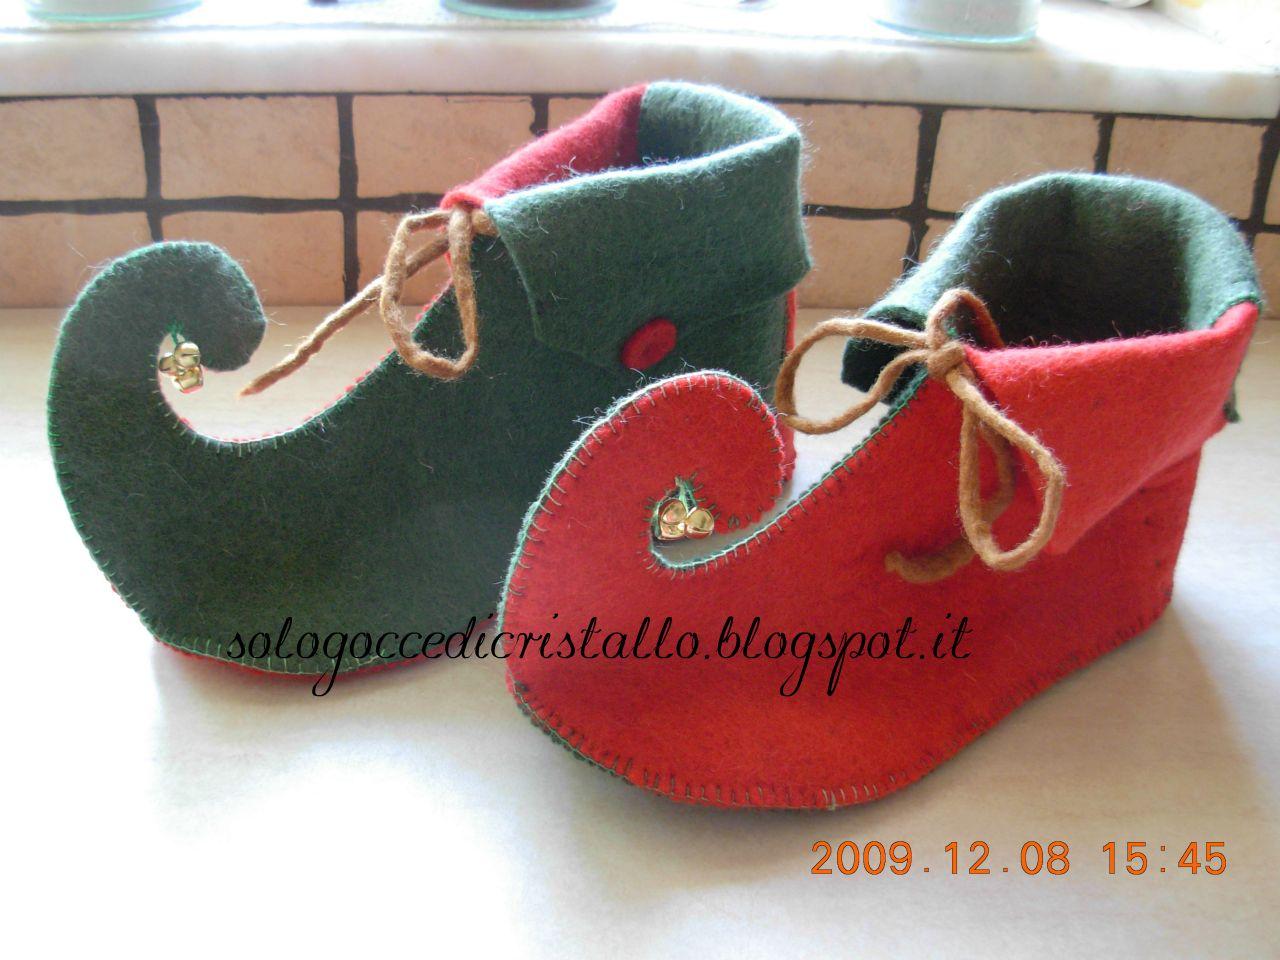 Solo gocce di cristallo pantofole follettose for Pantofole natalizie